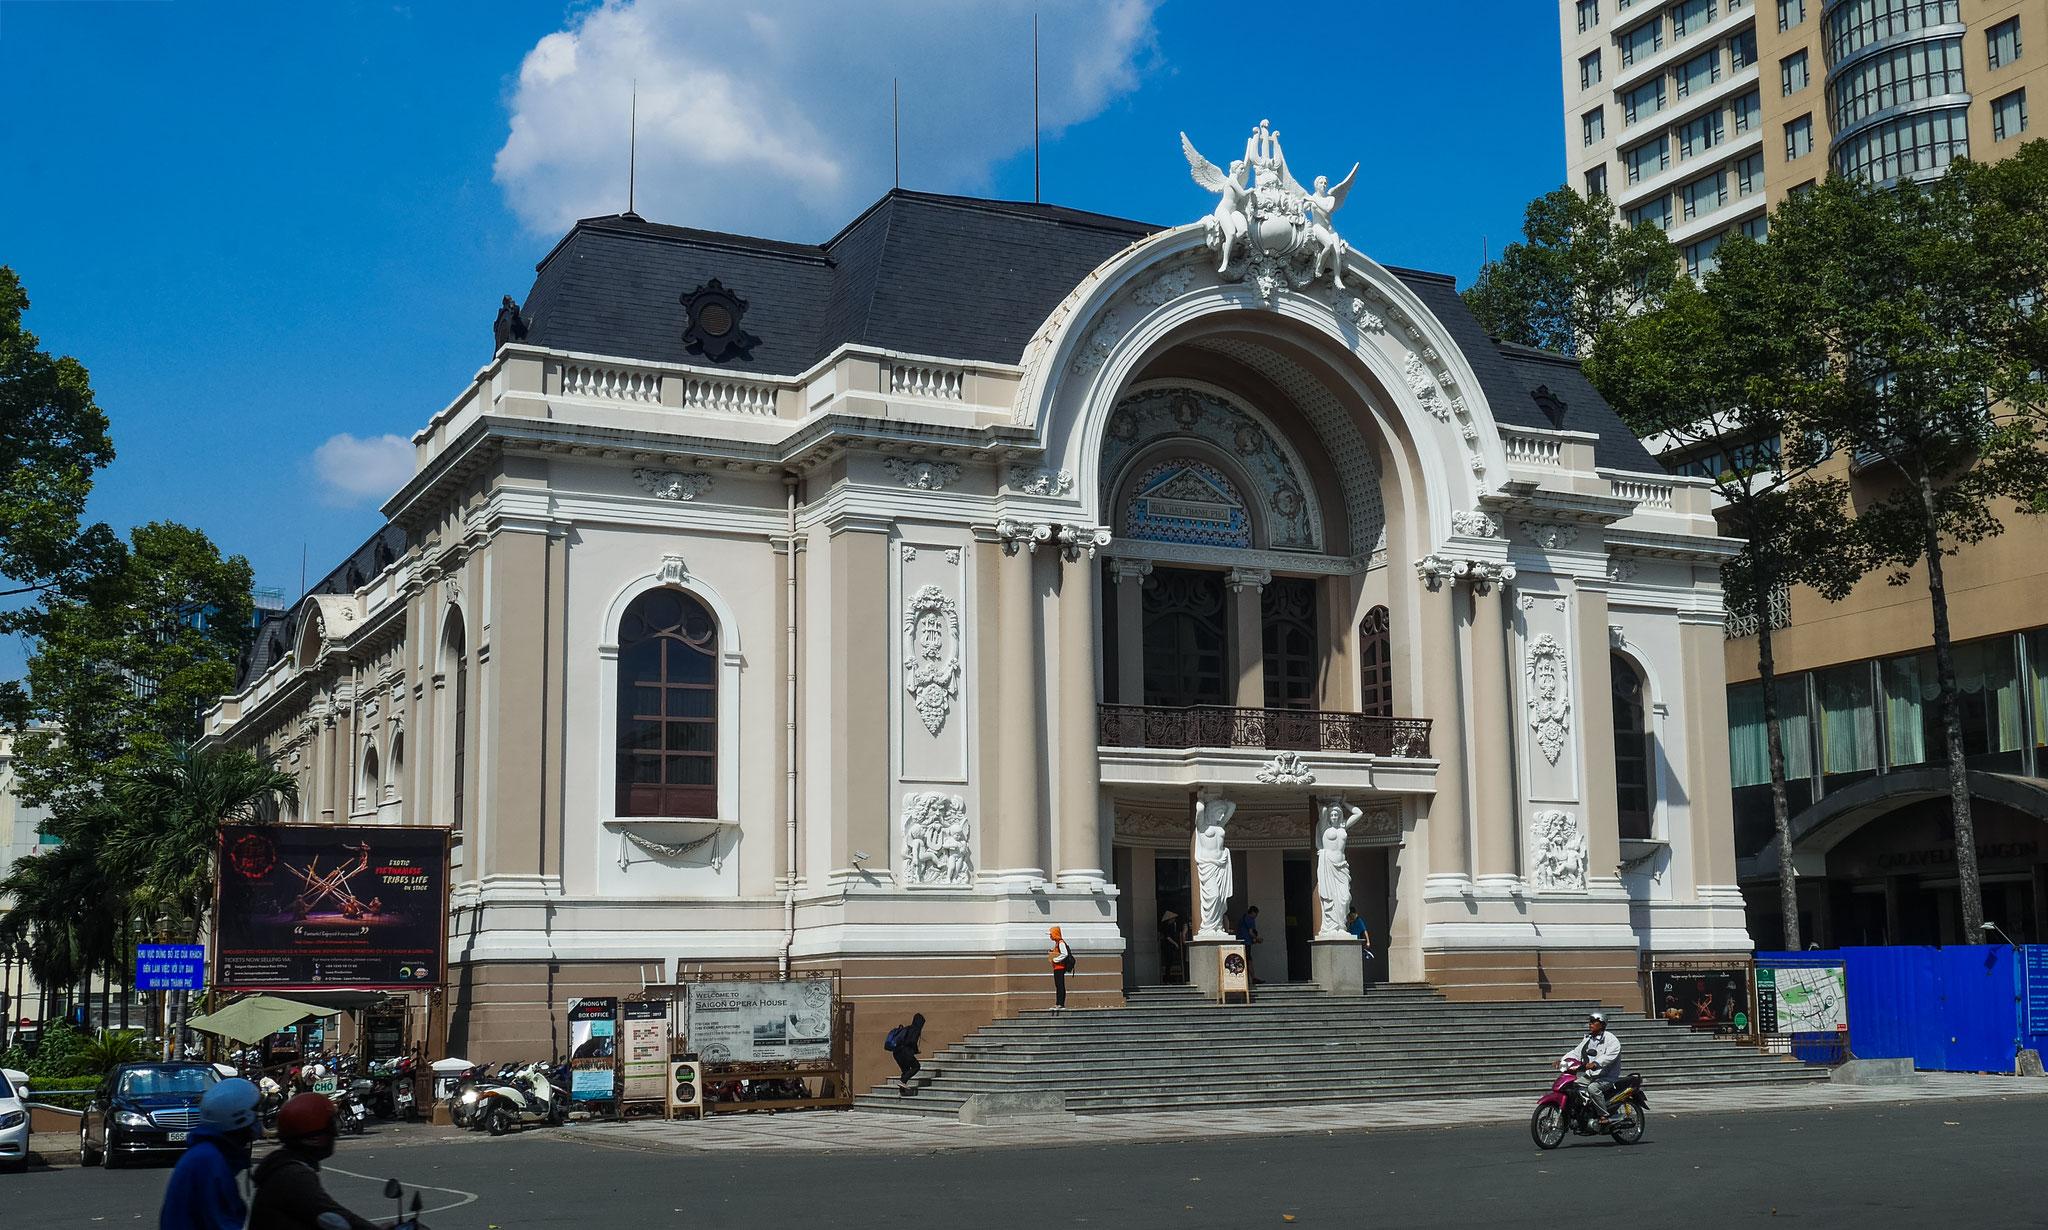 Ho-Chi-Minh-Stadt (Saigon) - Opernhaus